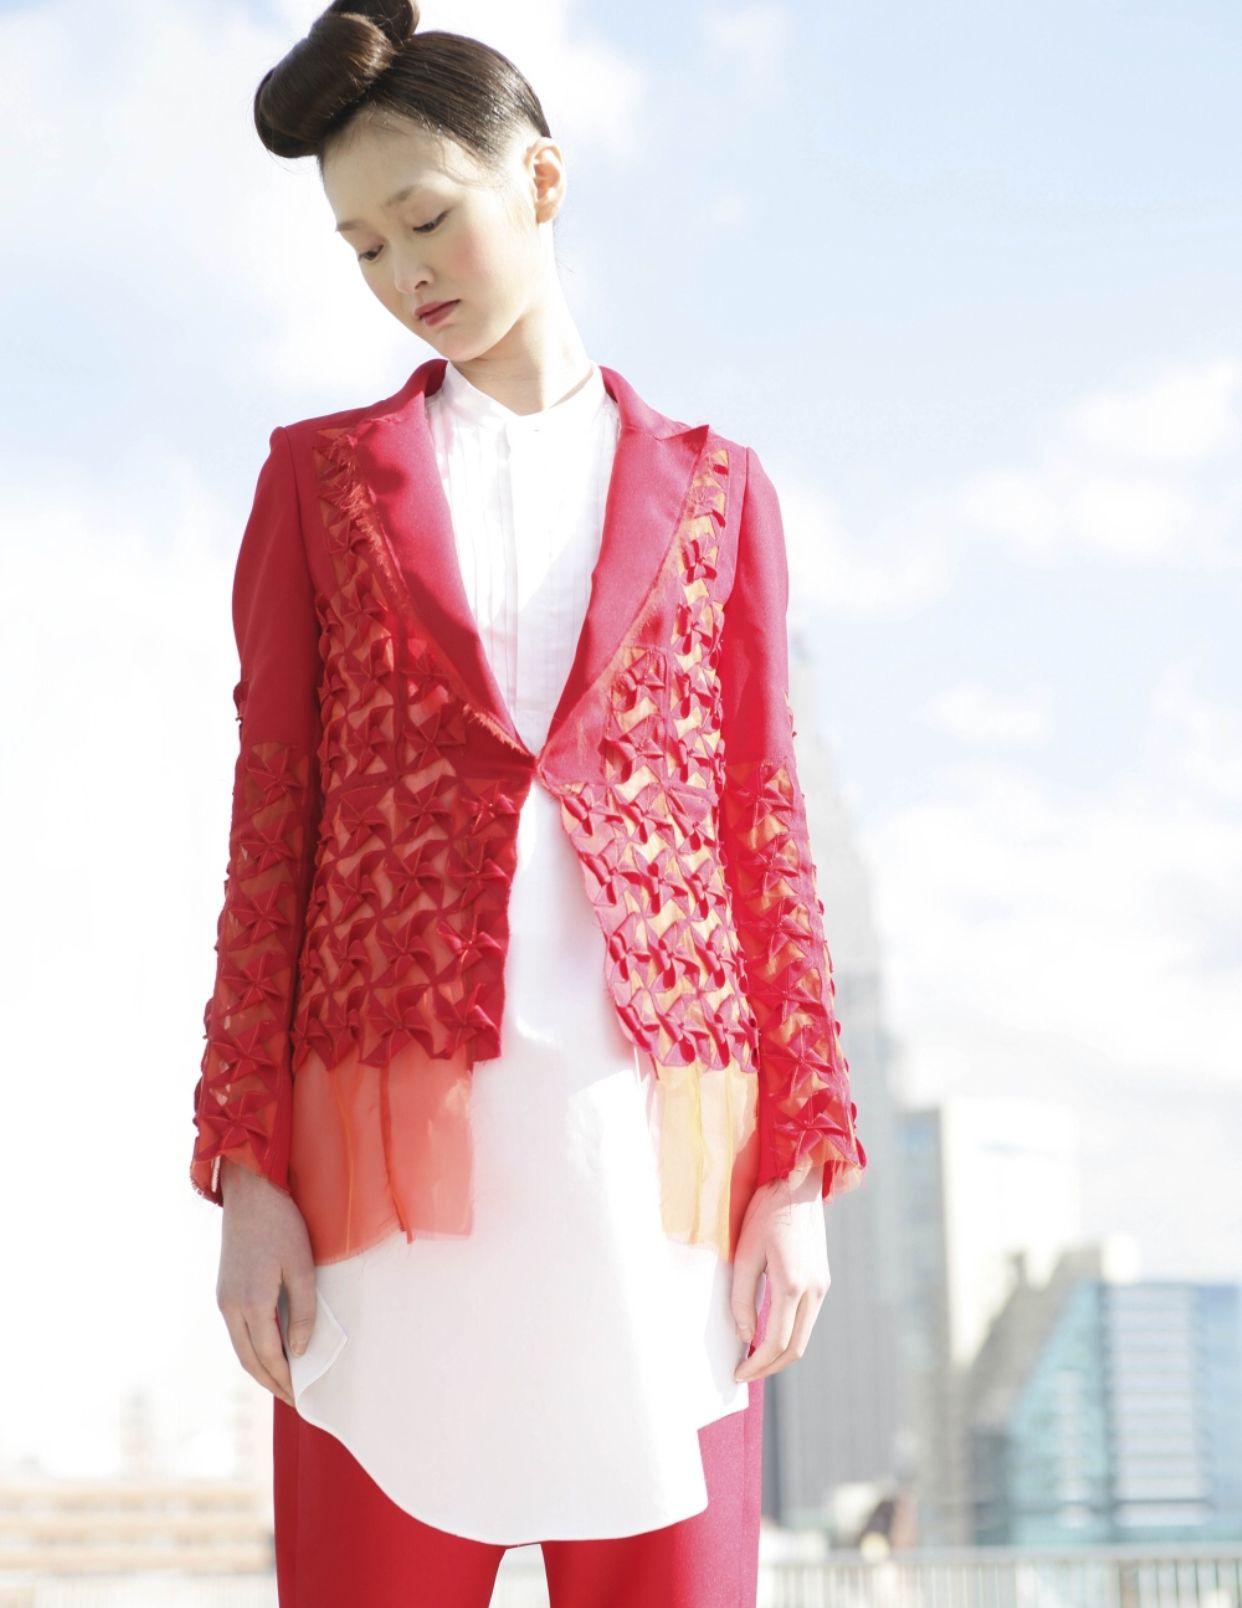 Ashlynn Park Fashion Designer Creative Patternmaker Windmill